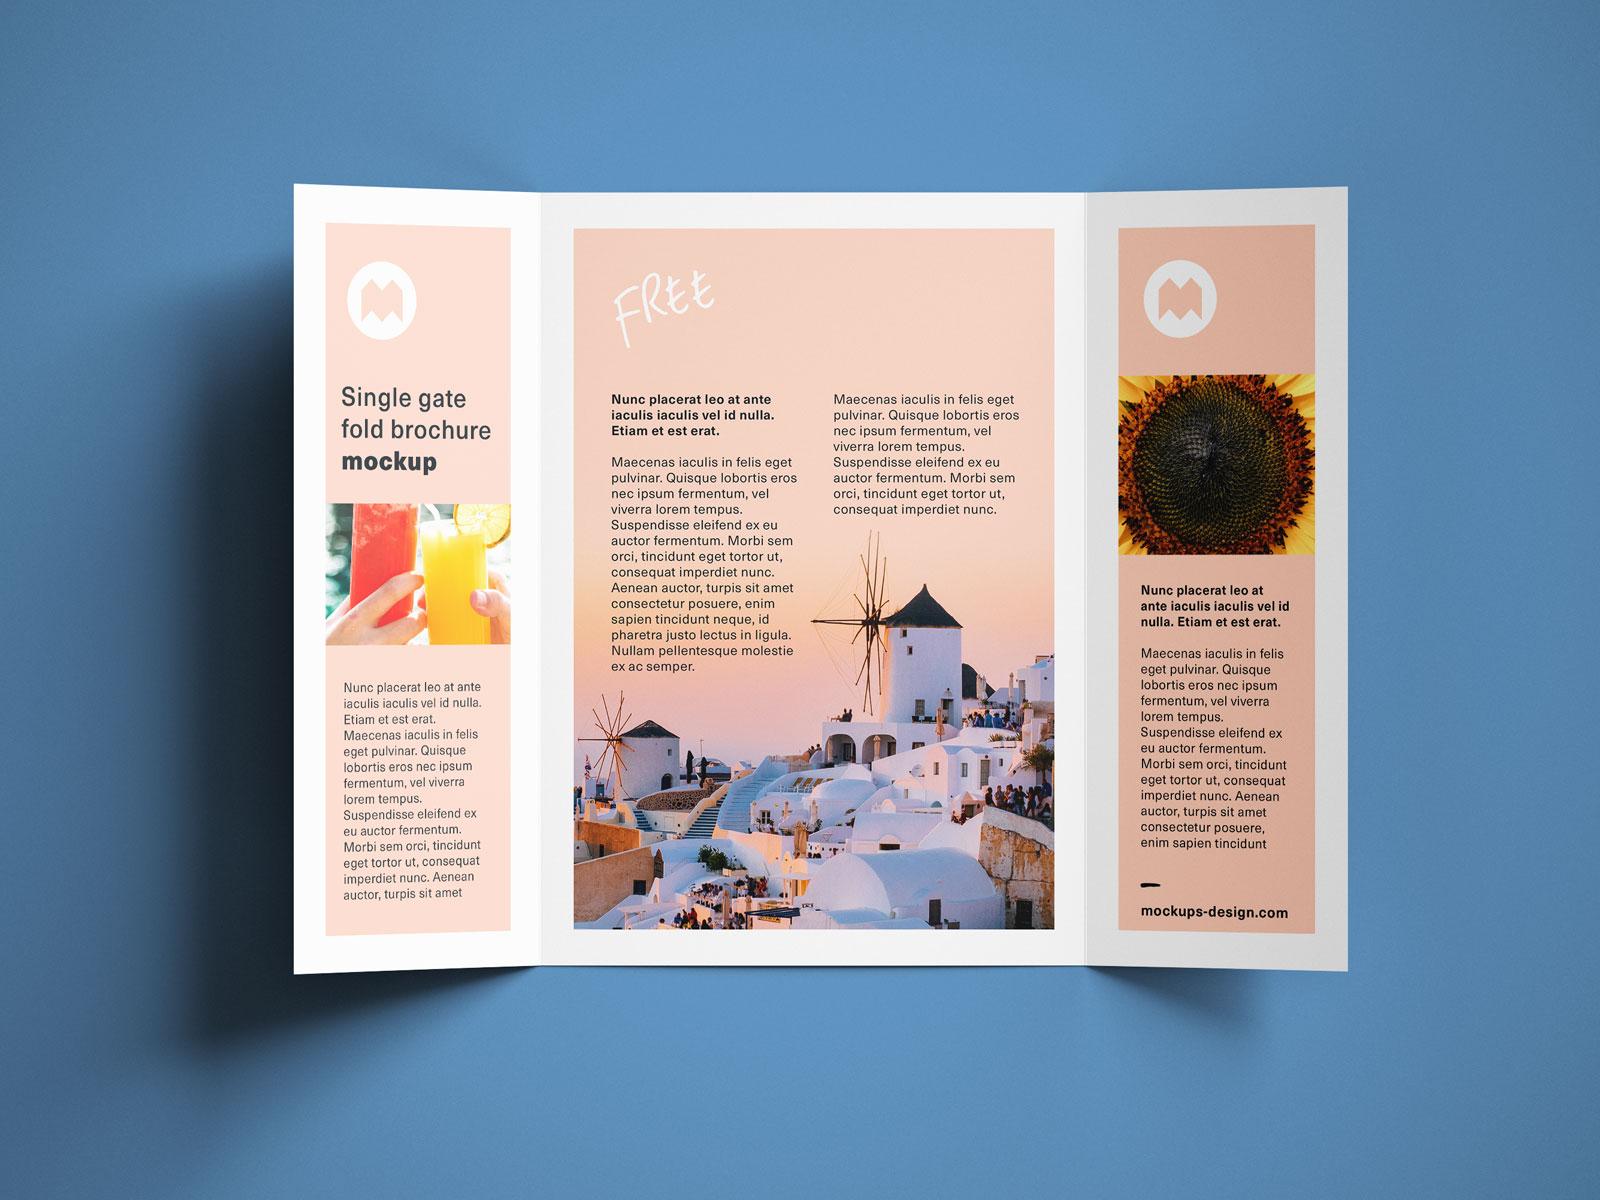 Free-Single-Gate-Fold-Brochure-Mockup-PSD-Set-4